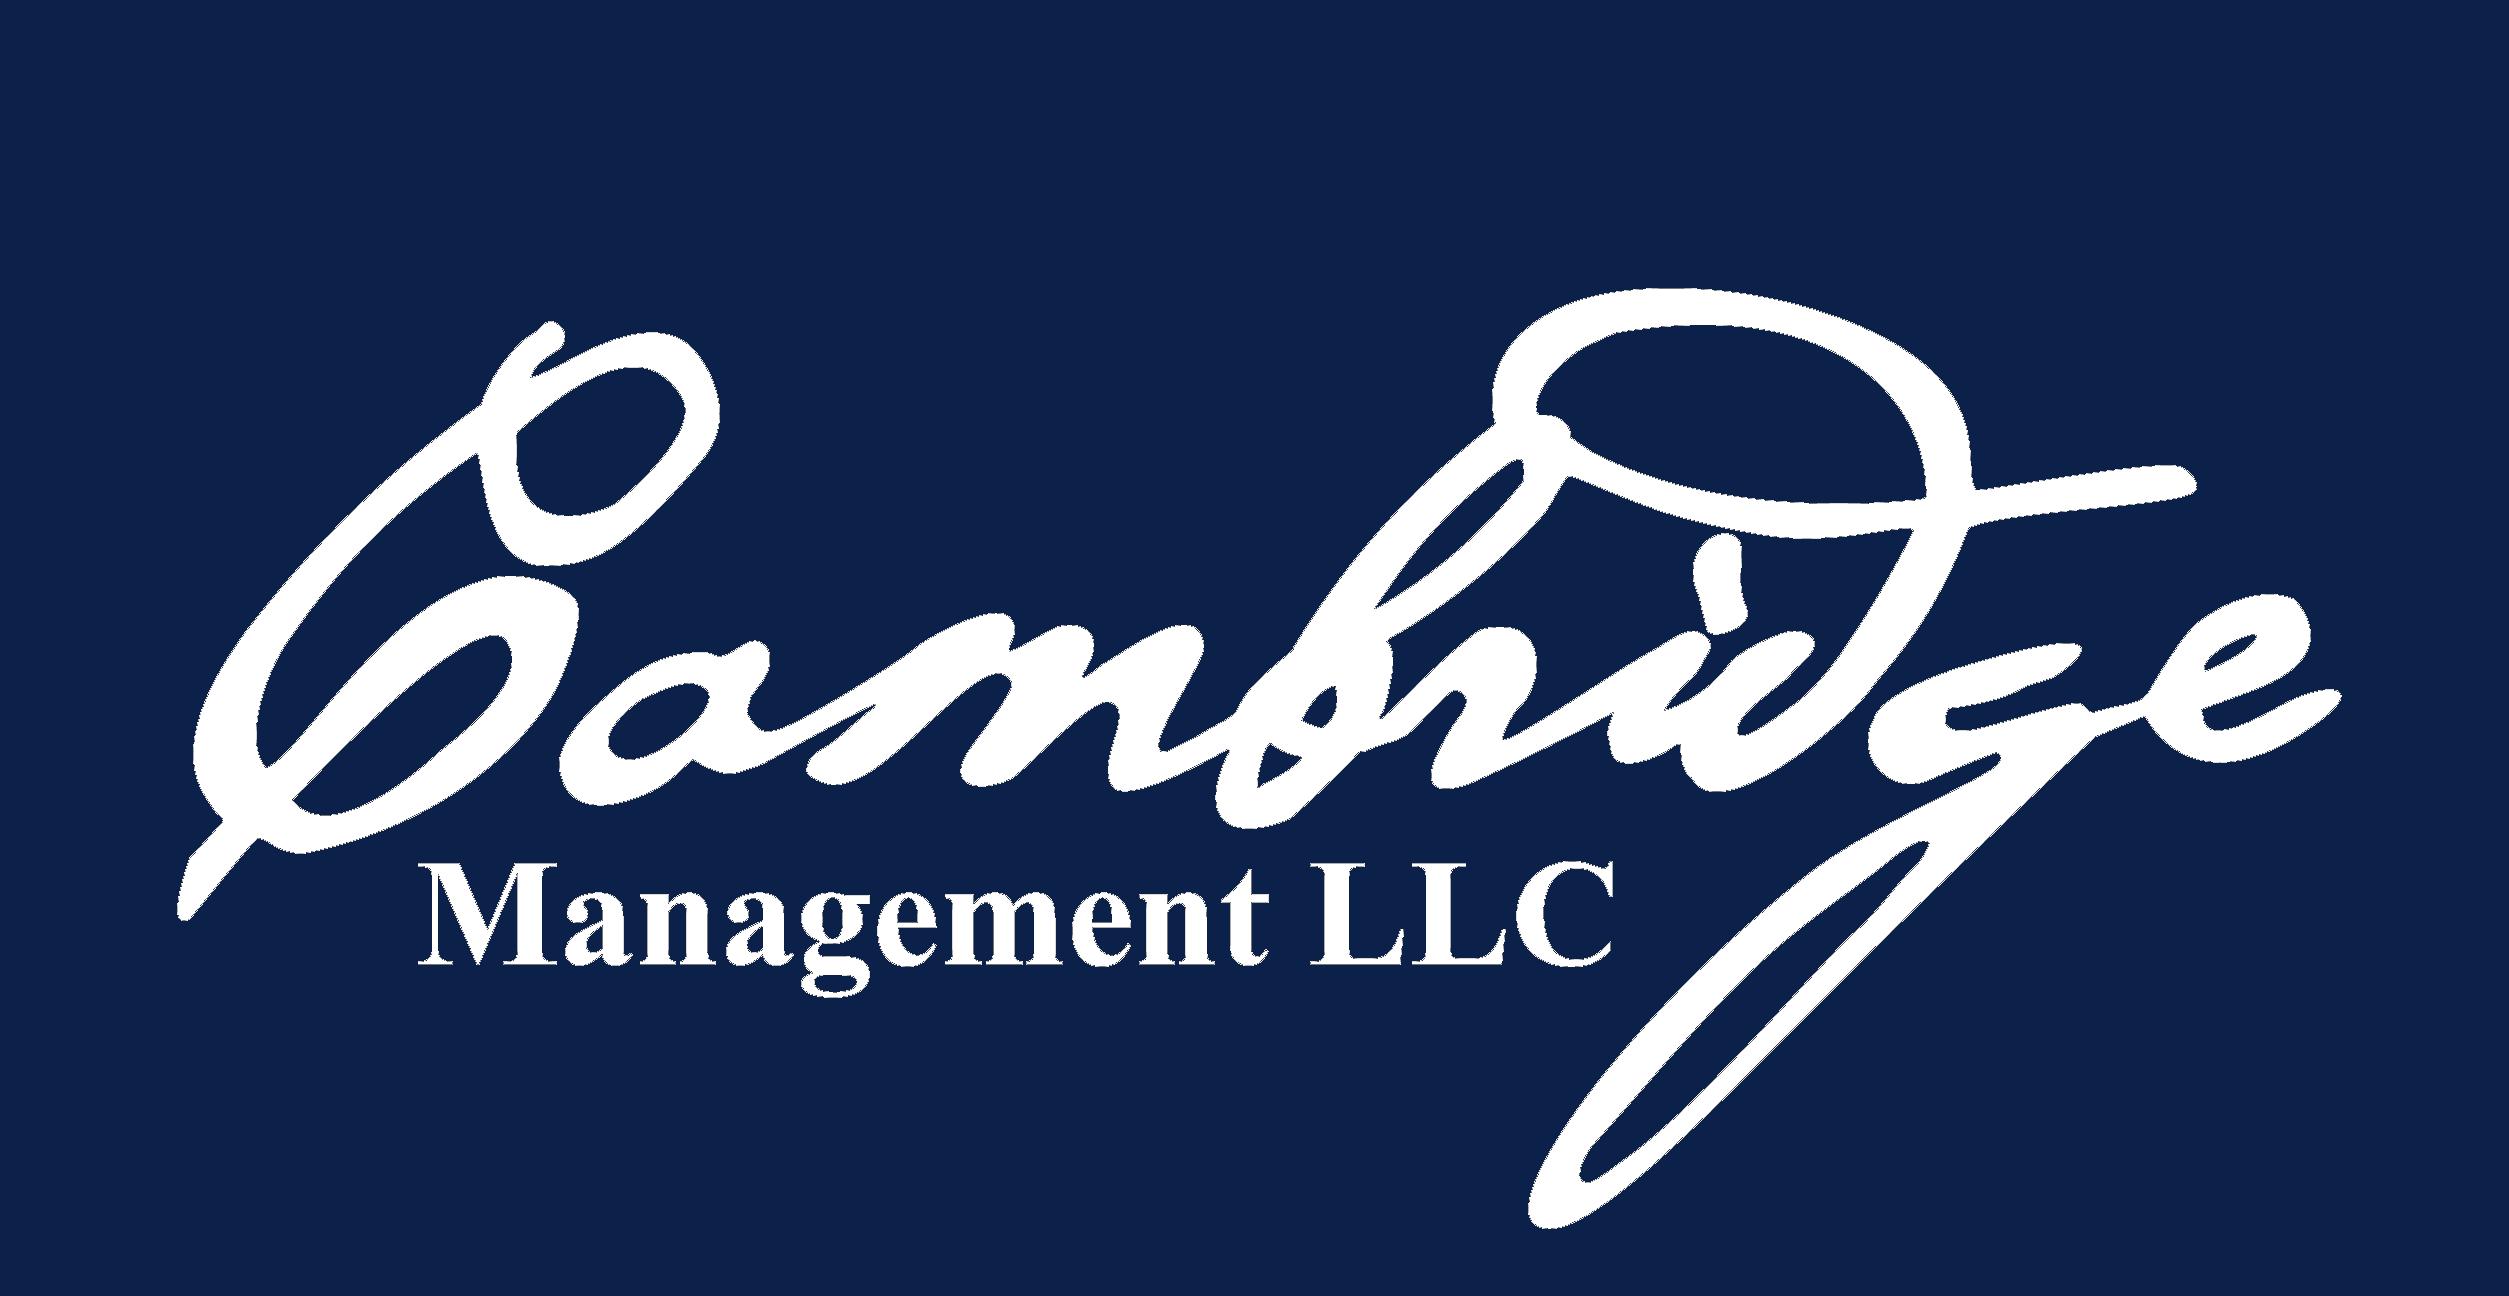 Cambridge Management LTD.